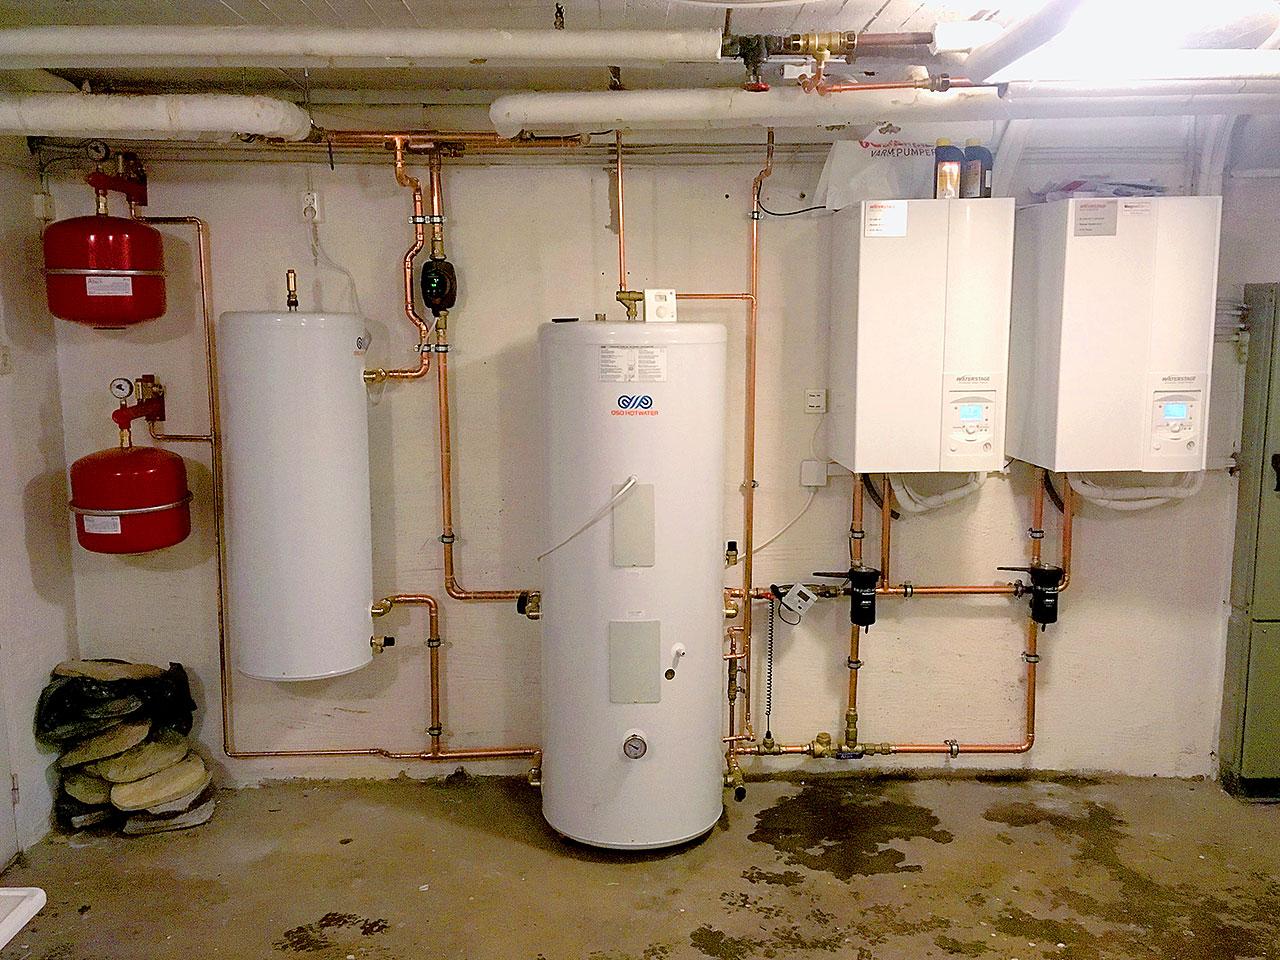 CMC Varme AS leverer varmepumper og smarte varmeløsninger